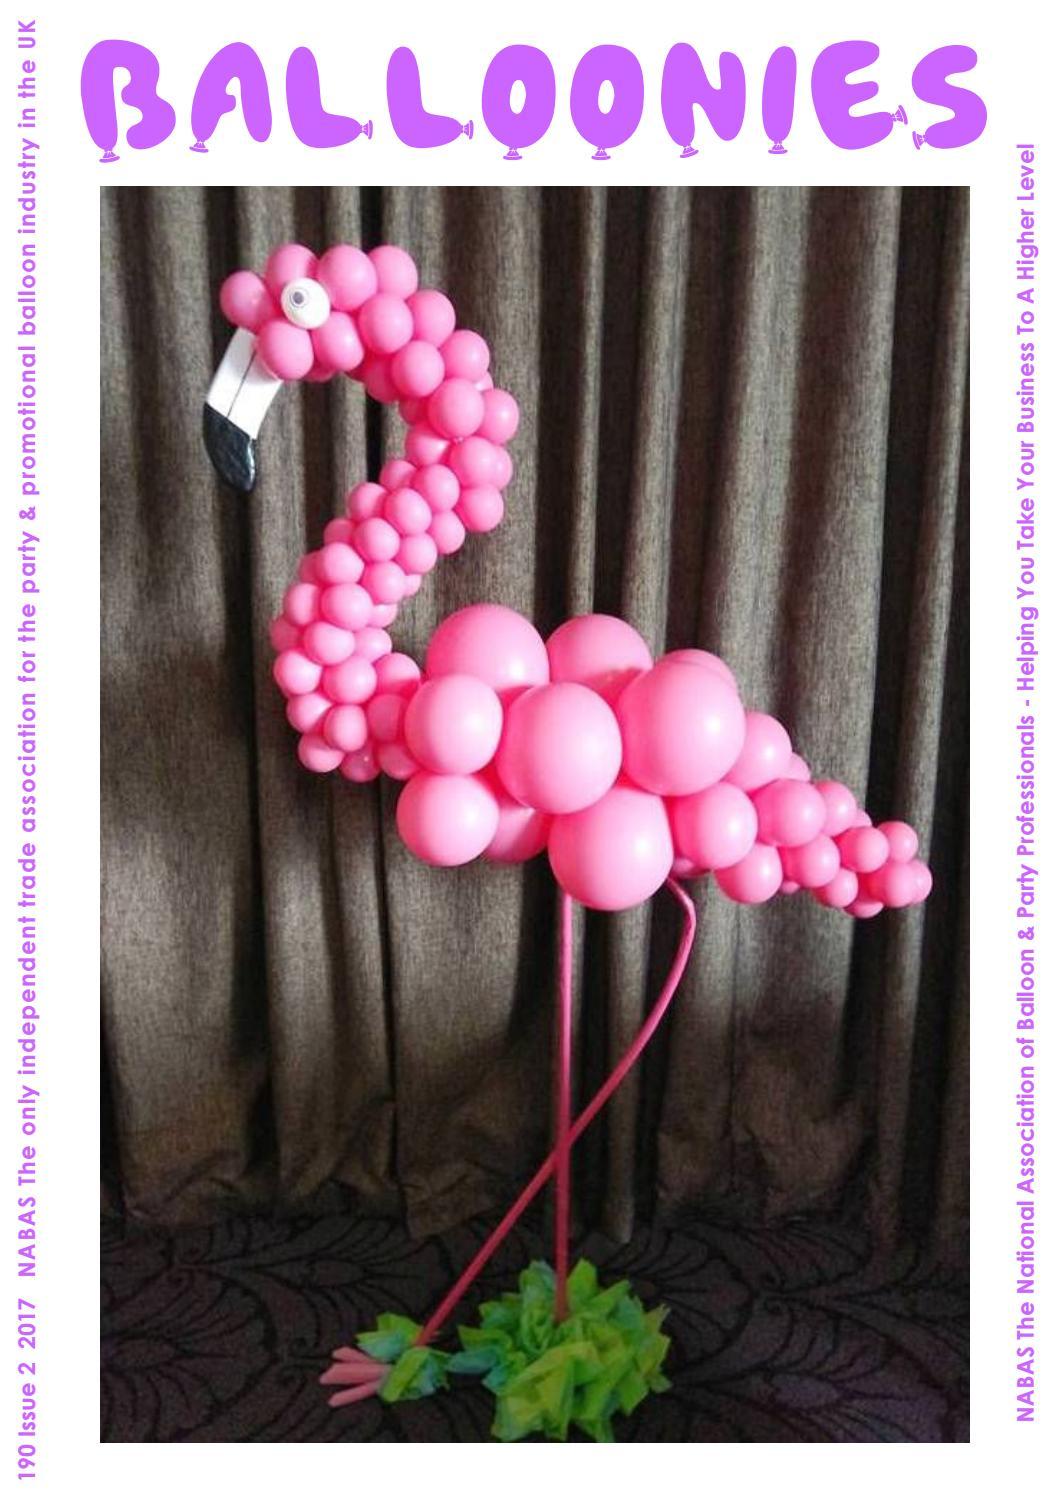 Go Balloonies